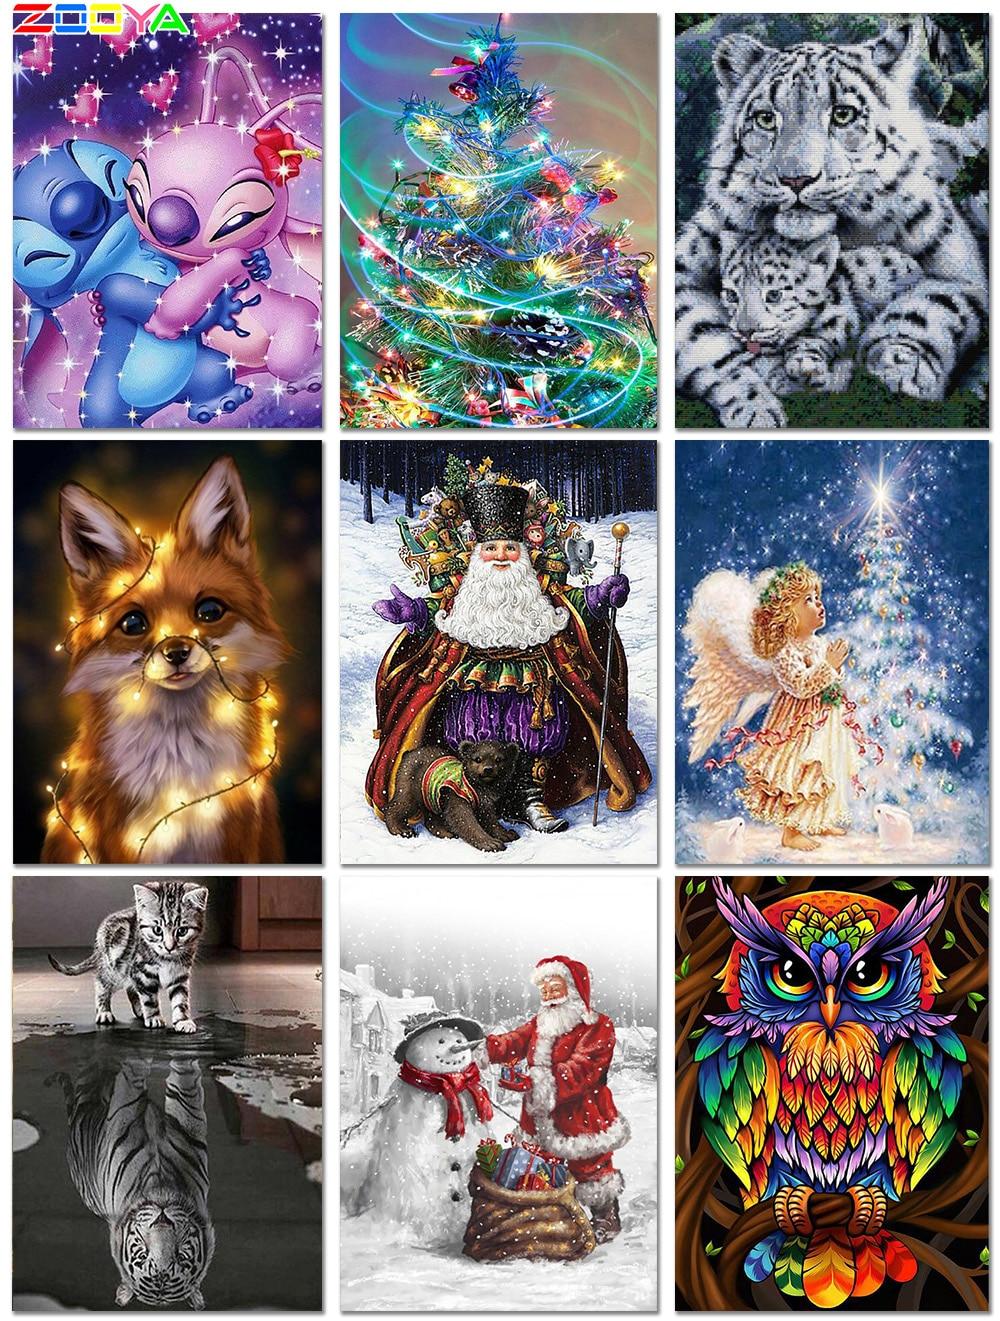 5D Diamond Painting Full Square/Round Christmas Diamond Embroidery Landscape Sleigh Elk Diamond Mosaic Santa Sled Gift Jh048